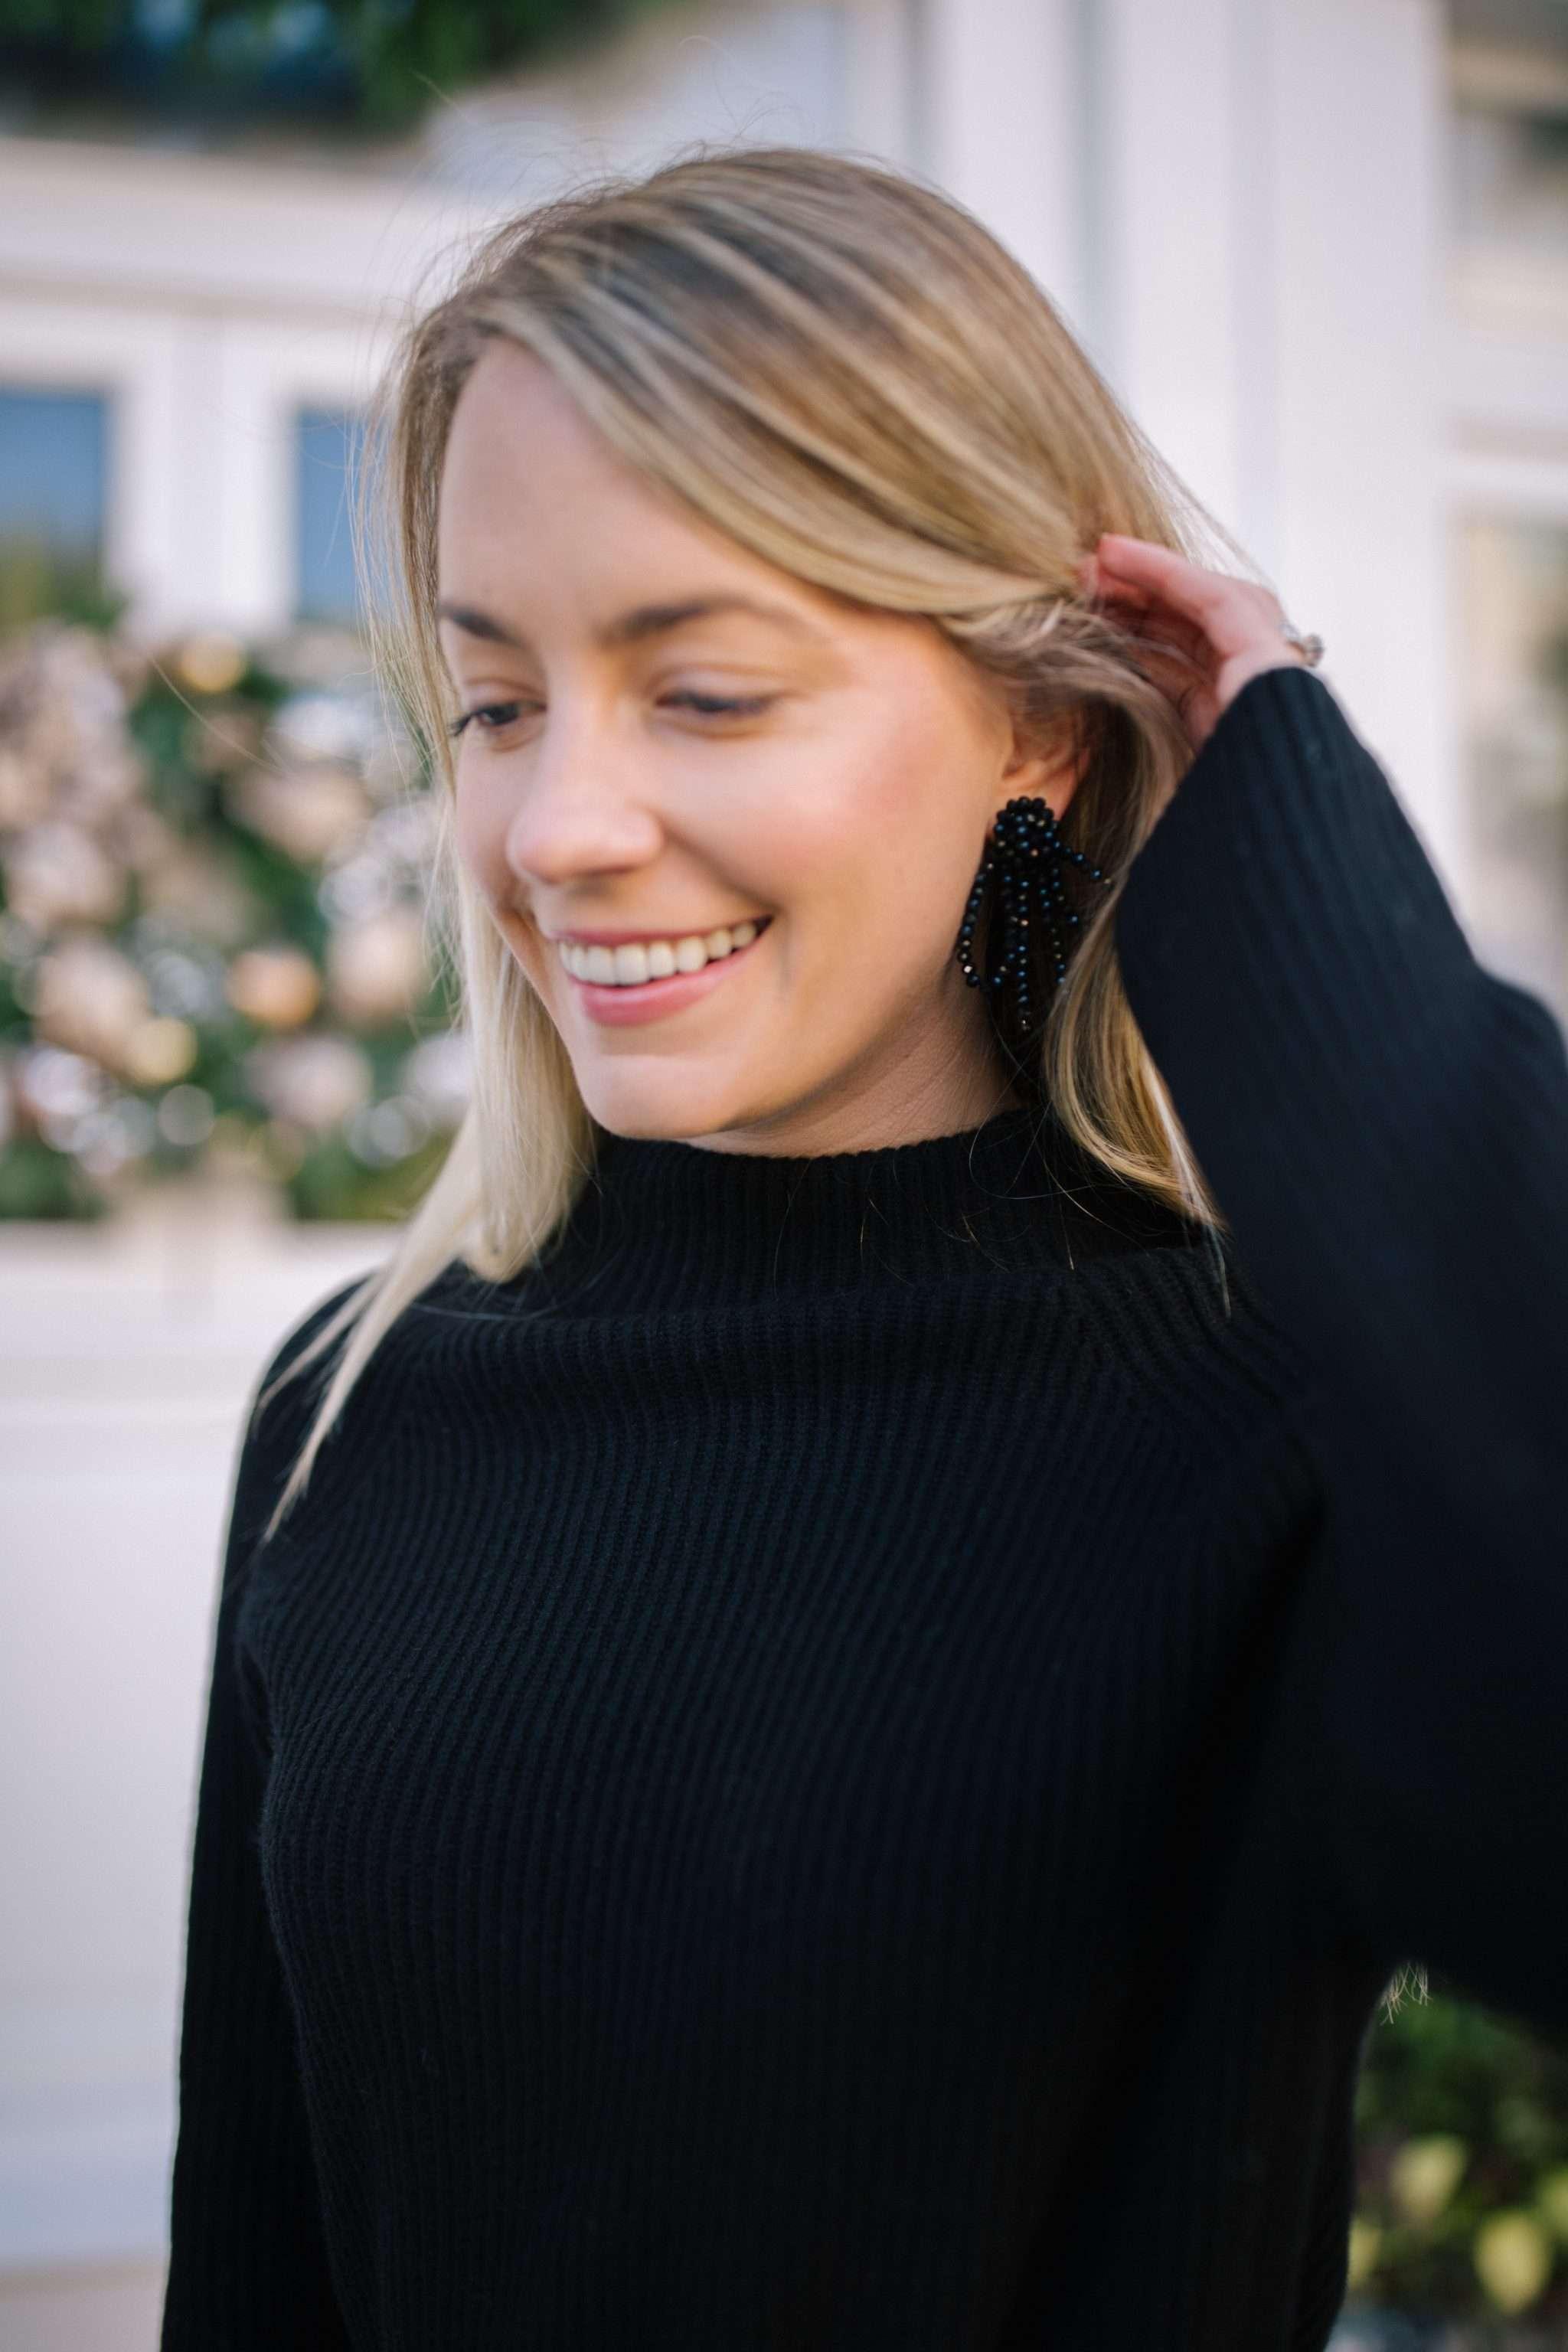 Classic and timeless black statement earrings + feminine statement earrings | Rhyme & Reason